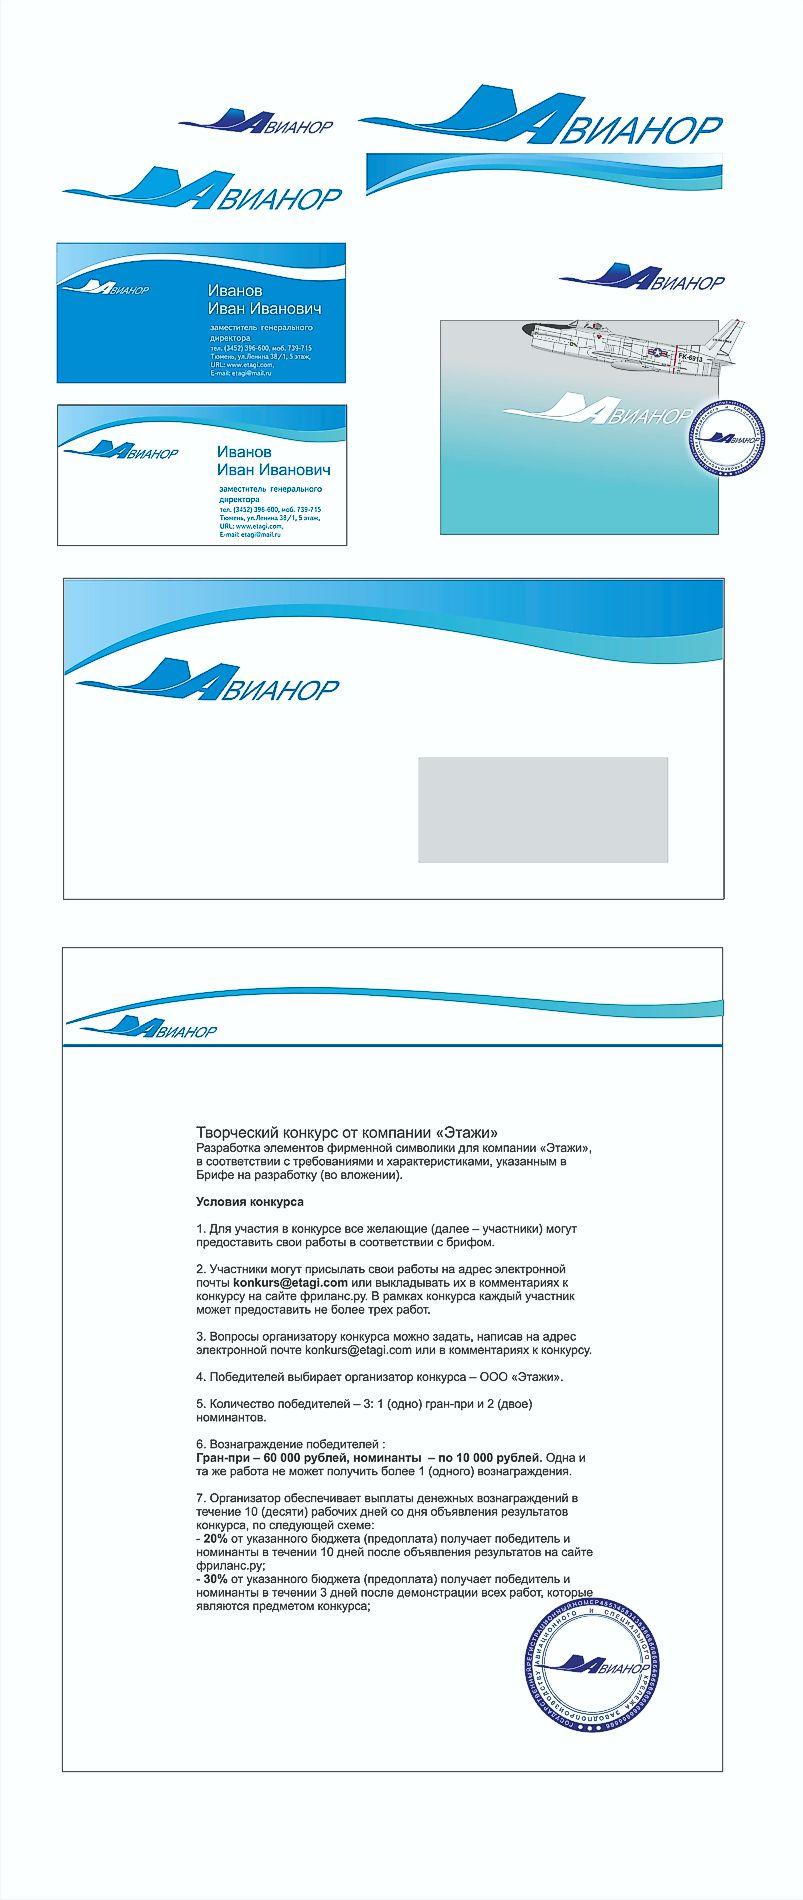 Нужен логотип и фирменный стиль для завода фото f_282528cf8f522ff4.jpg